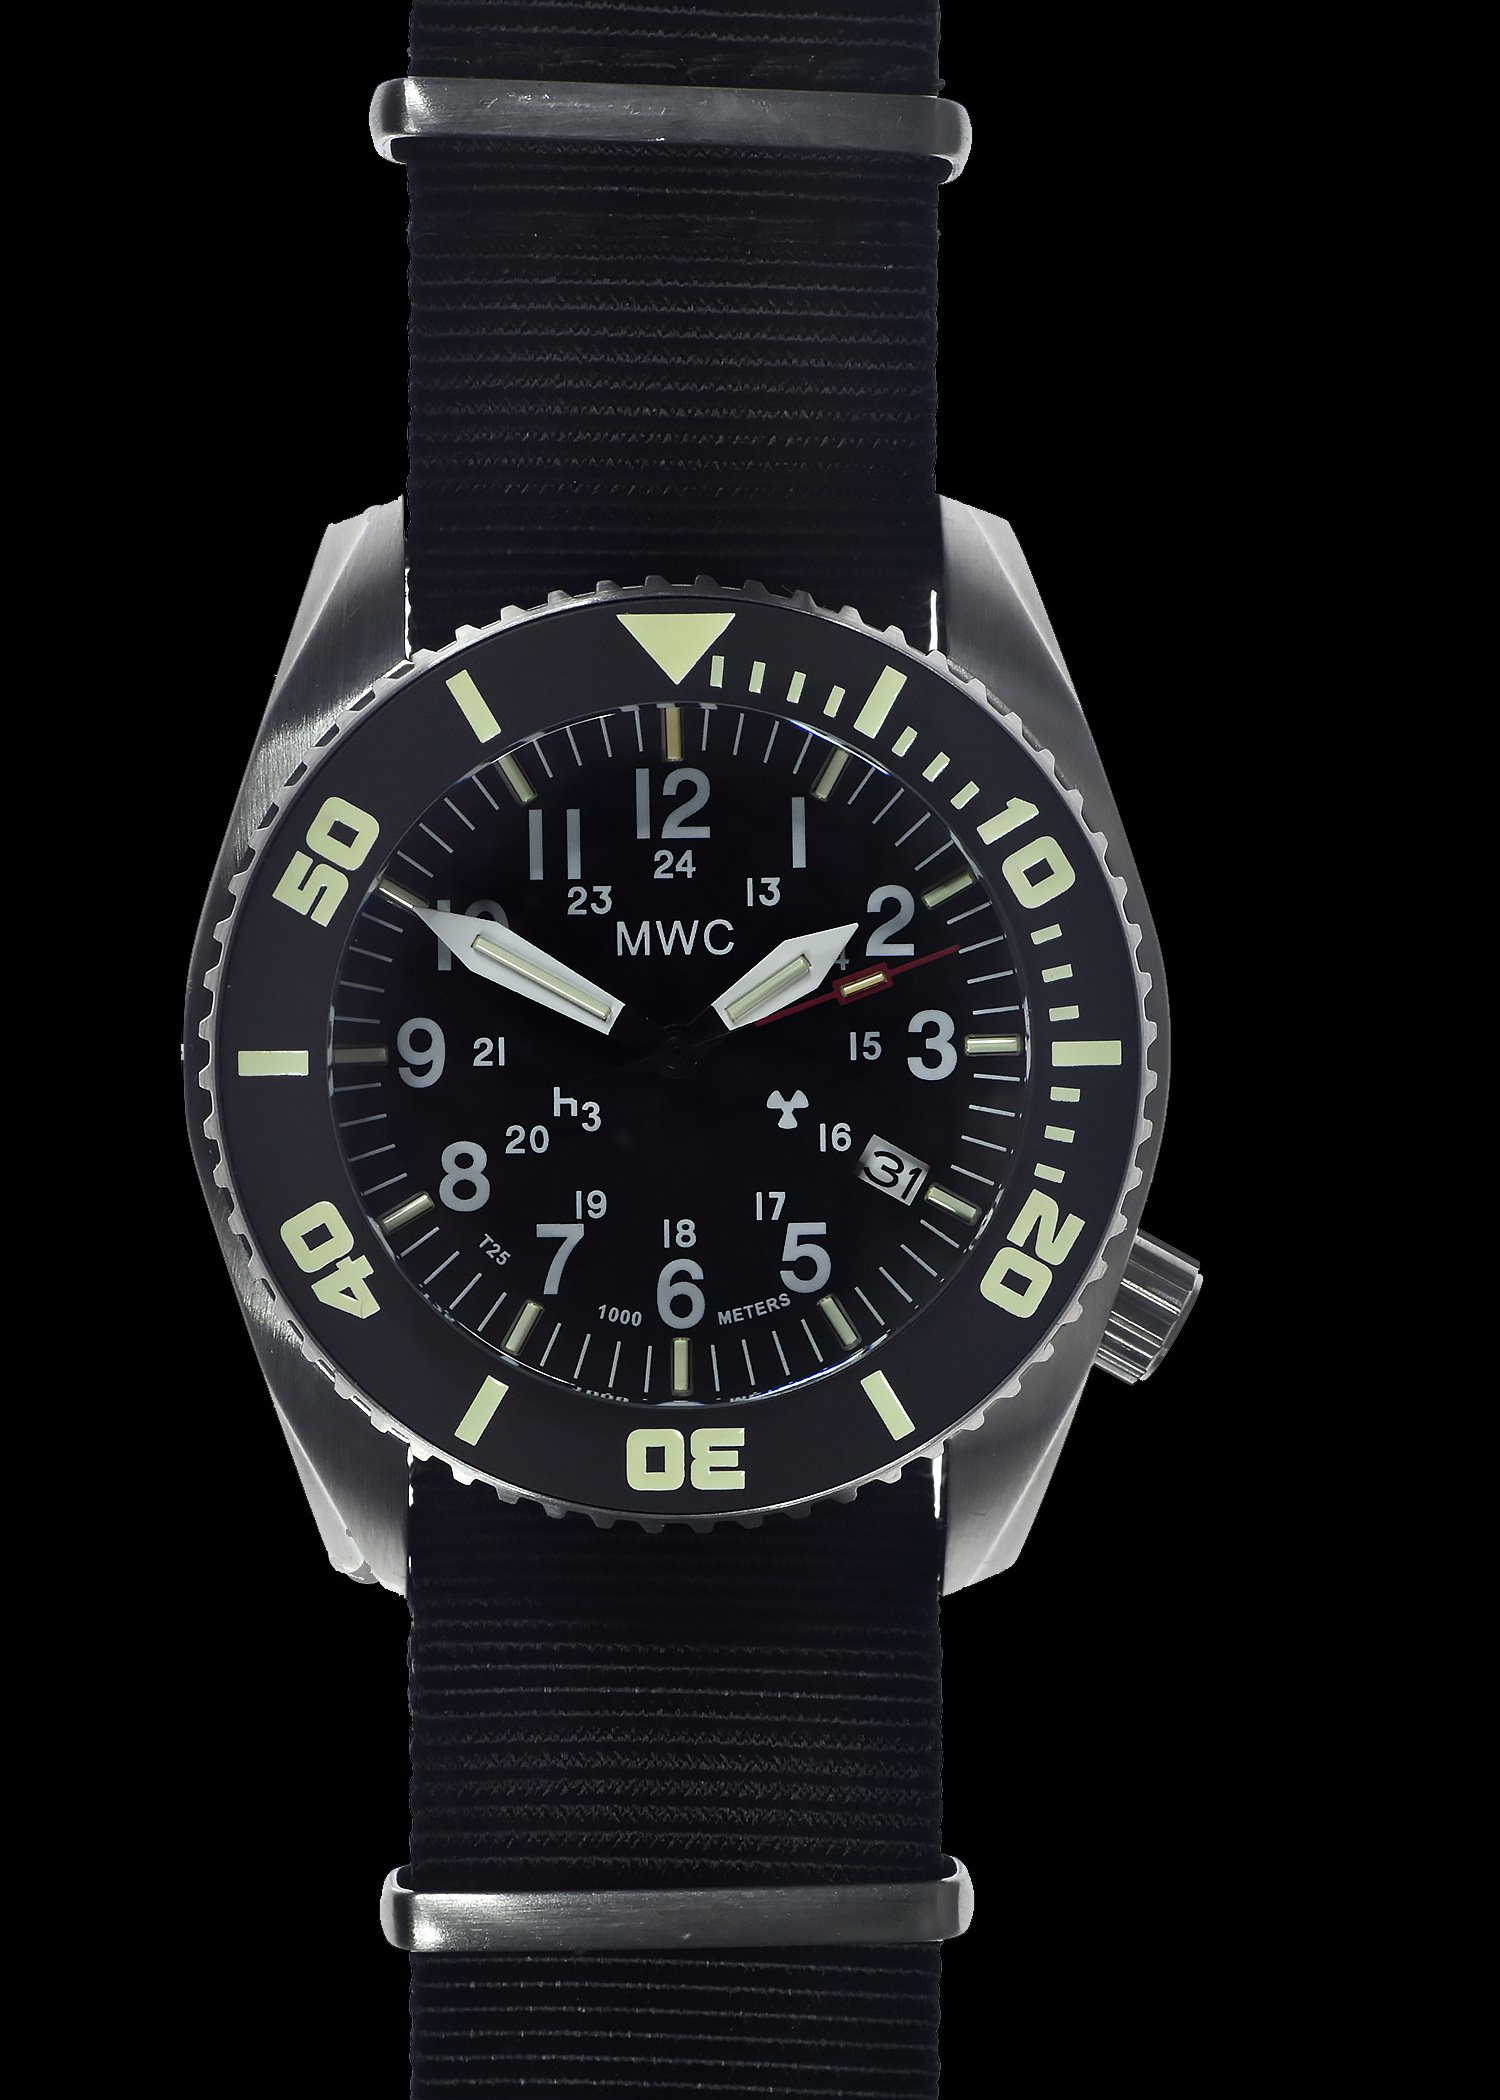 Водолазен часовник DEPTHMASTER Automatic Tritium GTLS 1000m / 100atm Military Divers Helium - MWC